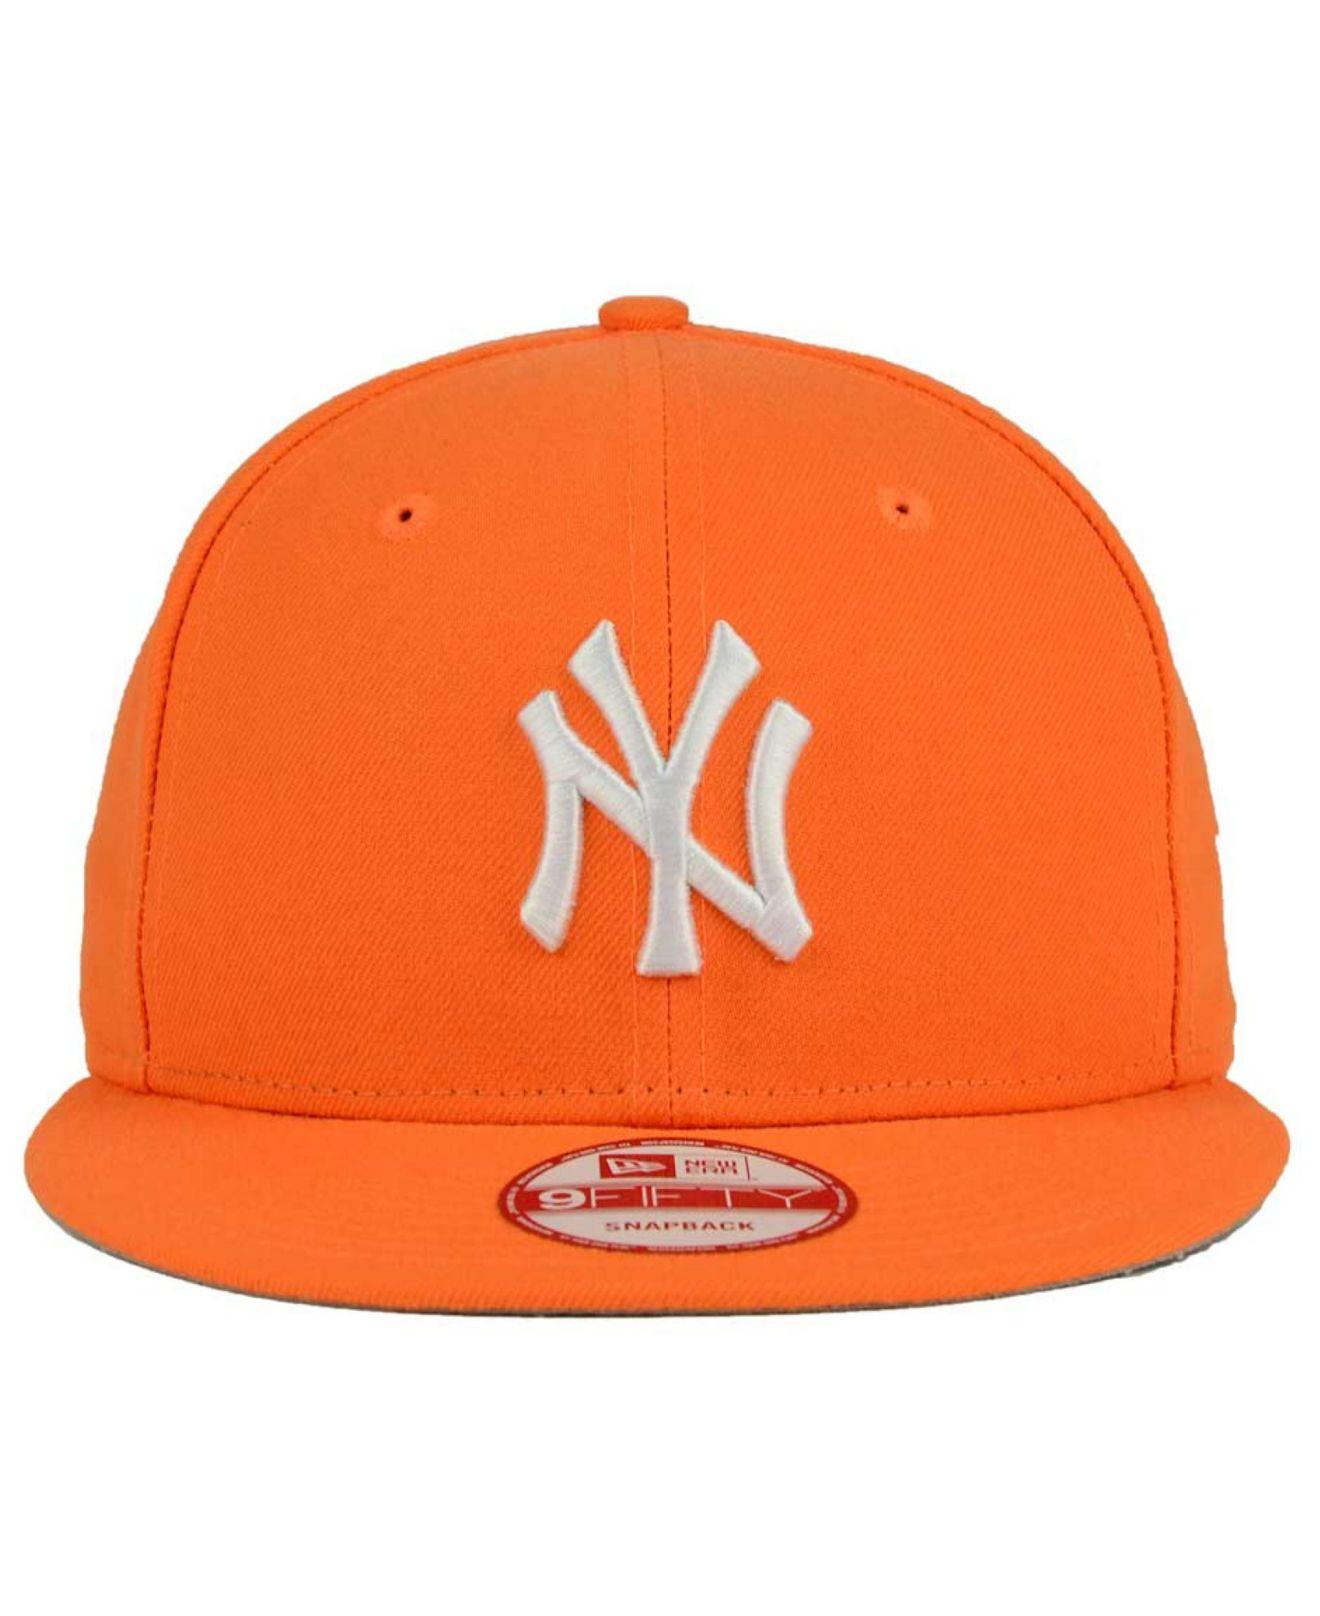 3a13ffcc4aa ... usa lyst ktz new york yankees c dub 9fifty snapback cap in orange for  men 70ef4